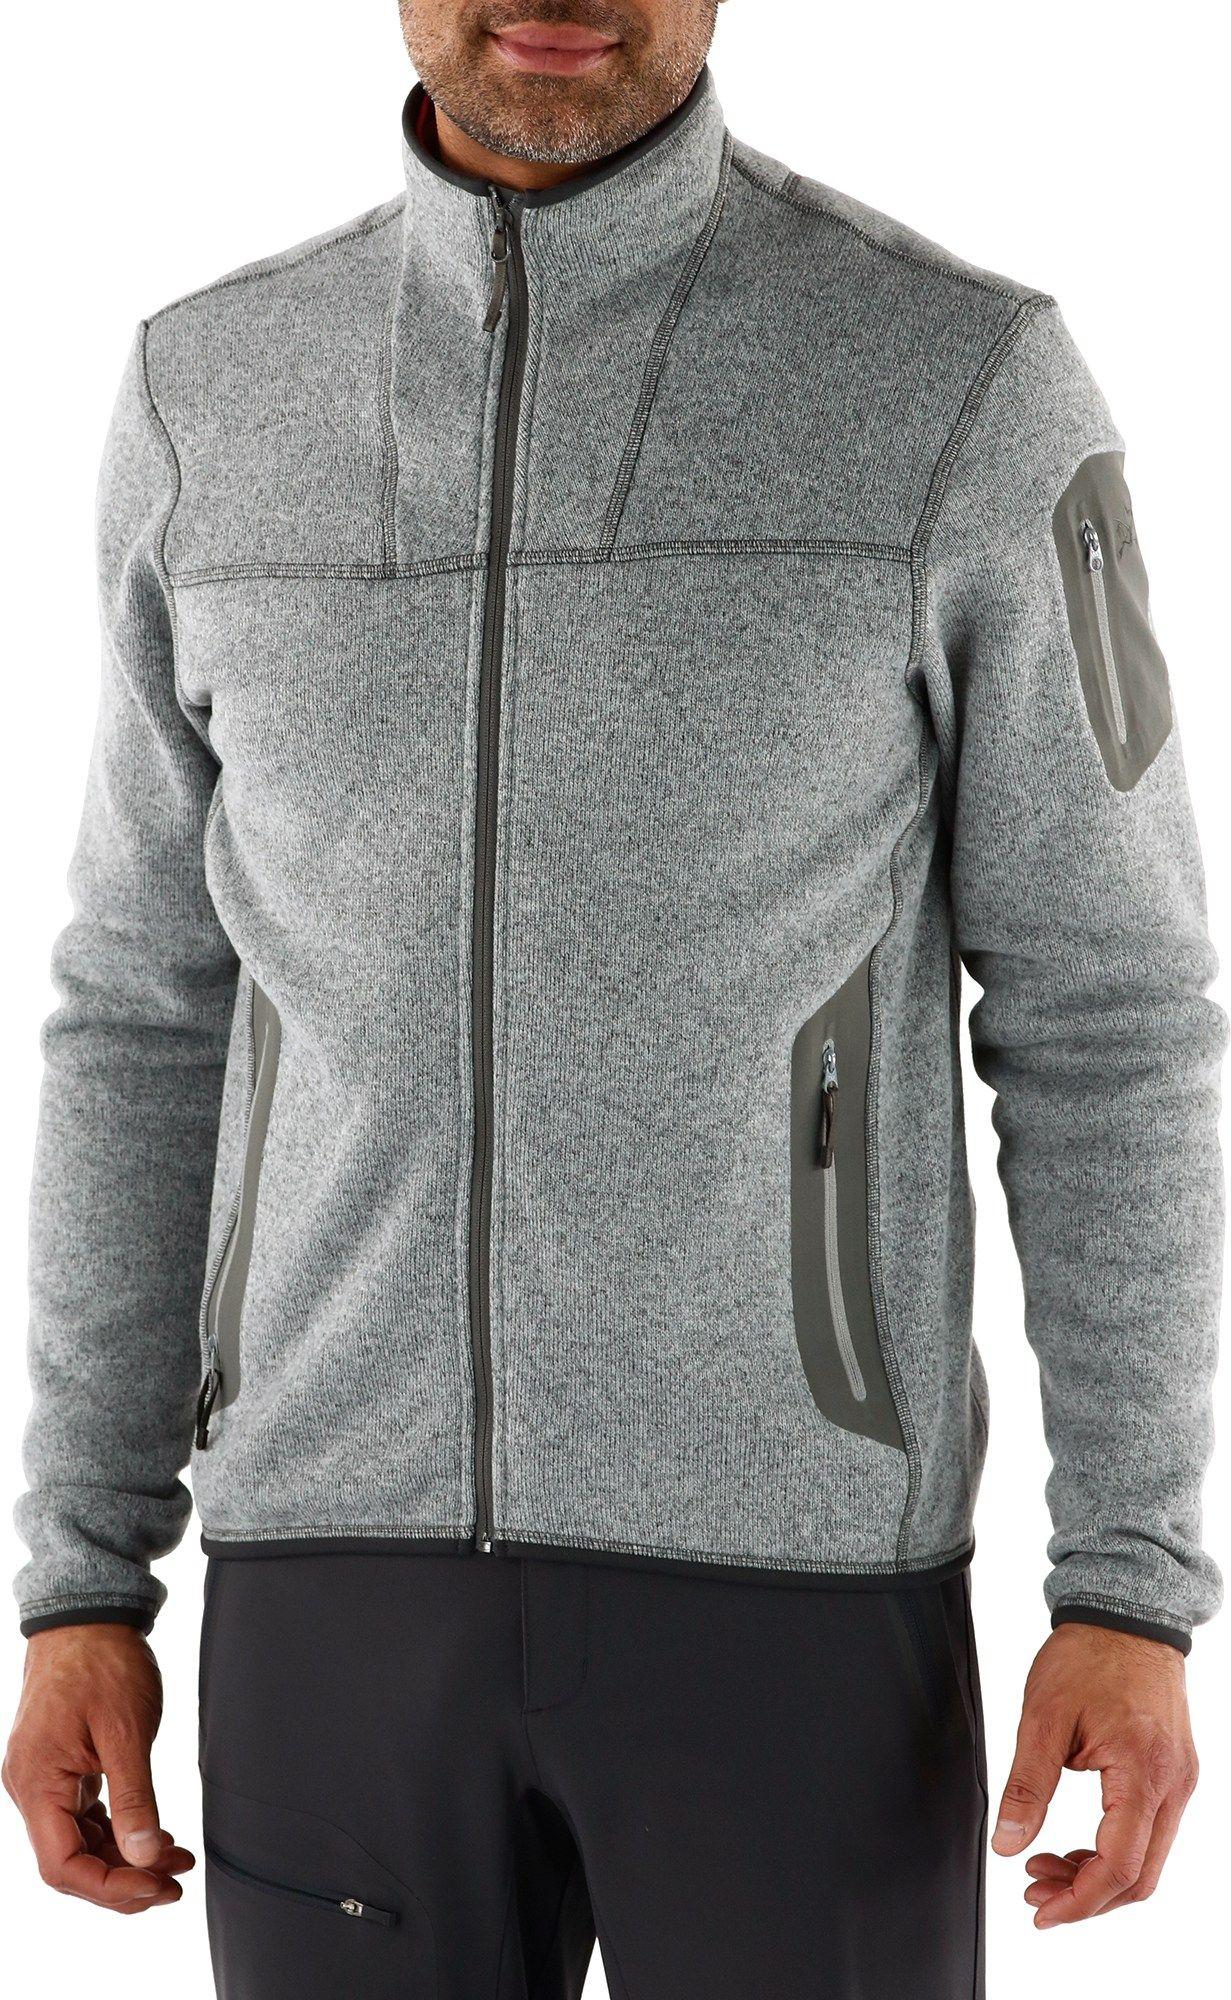 Arcuteryx male covert cardigan fleece jacket menus fashion